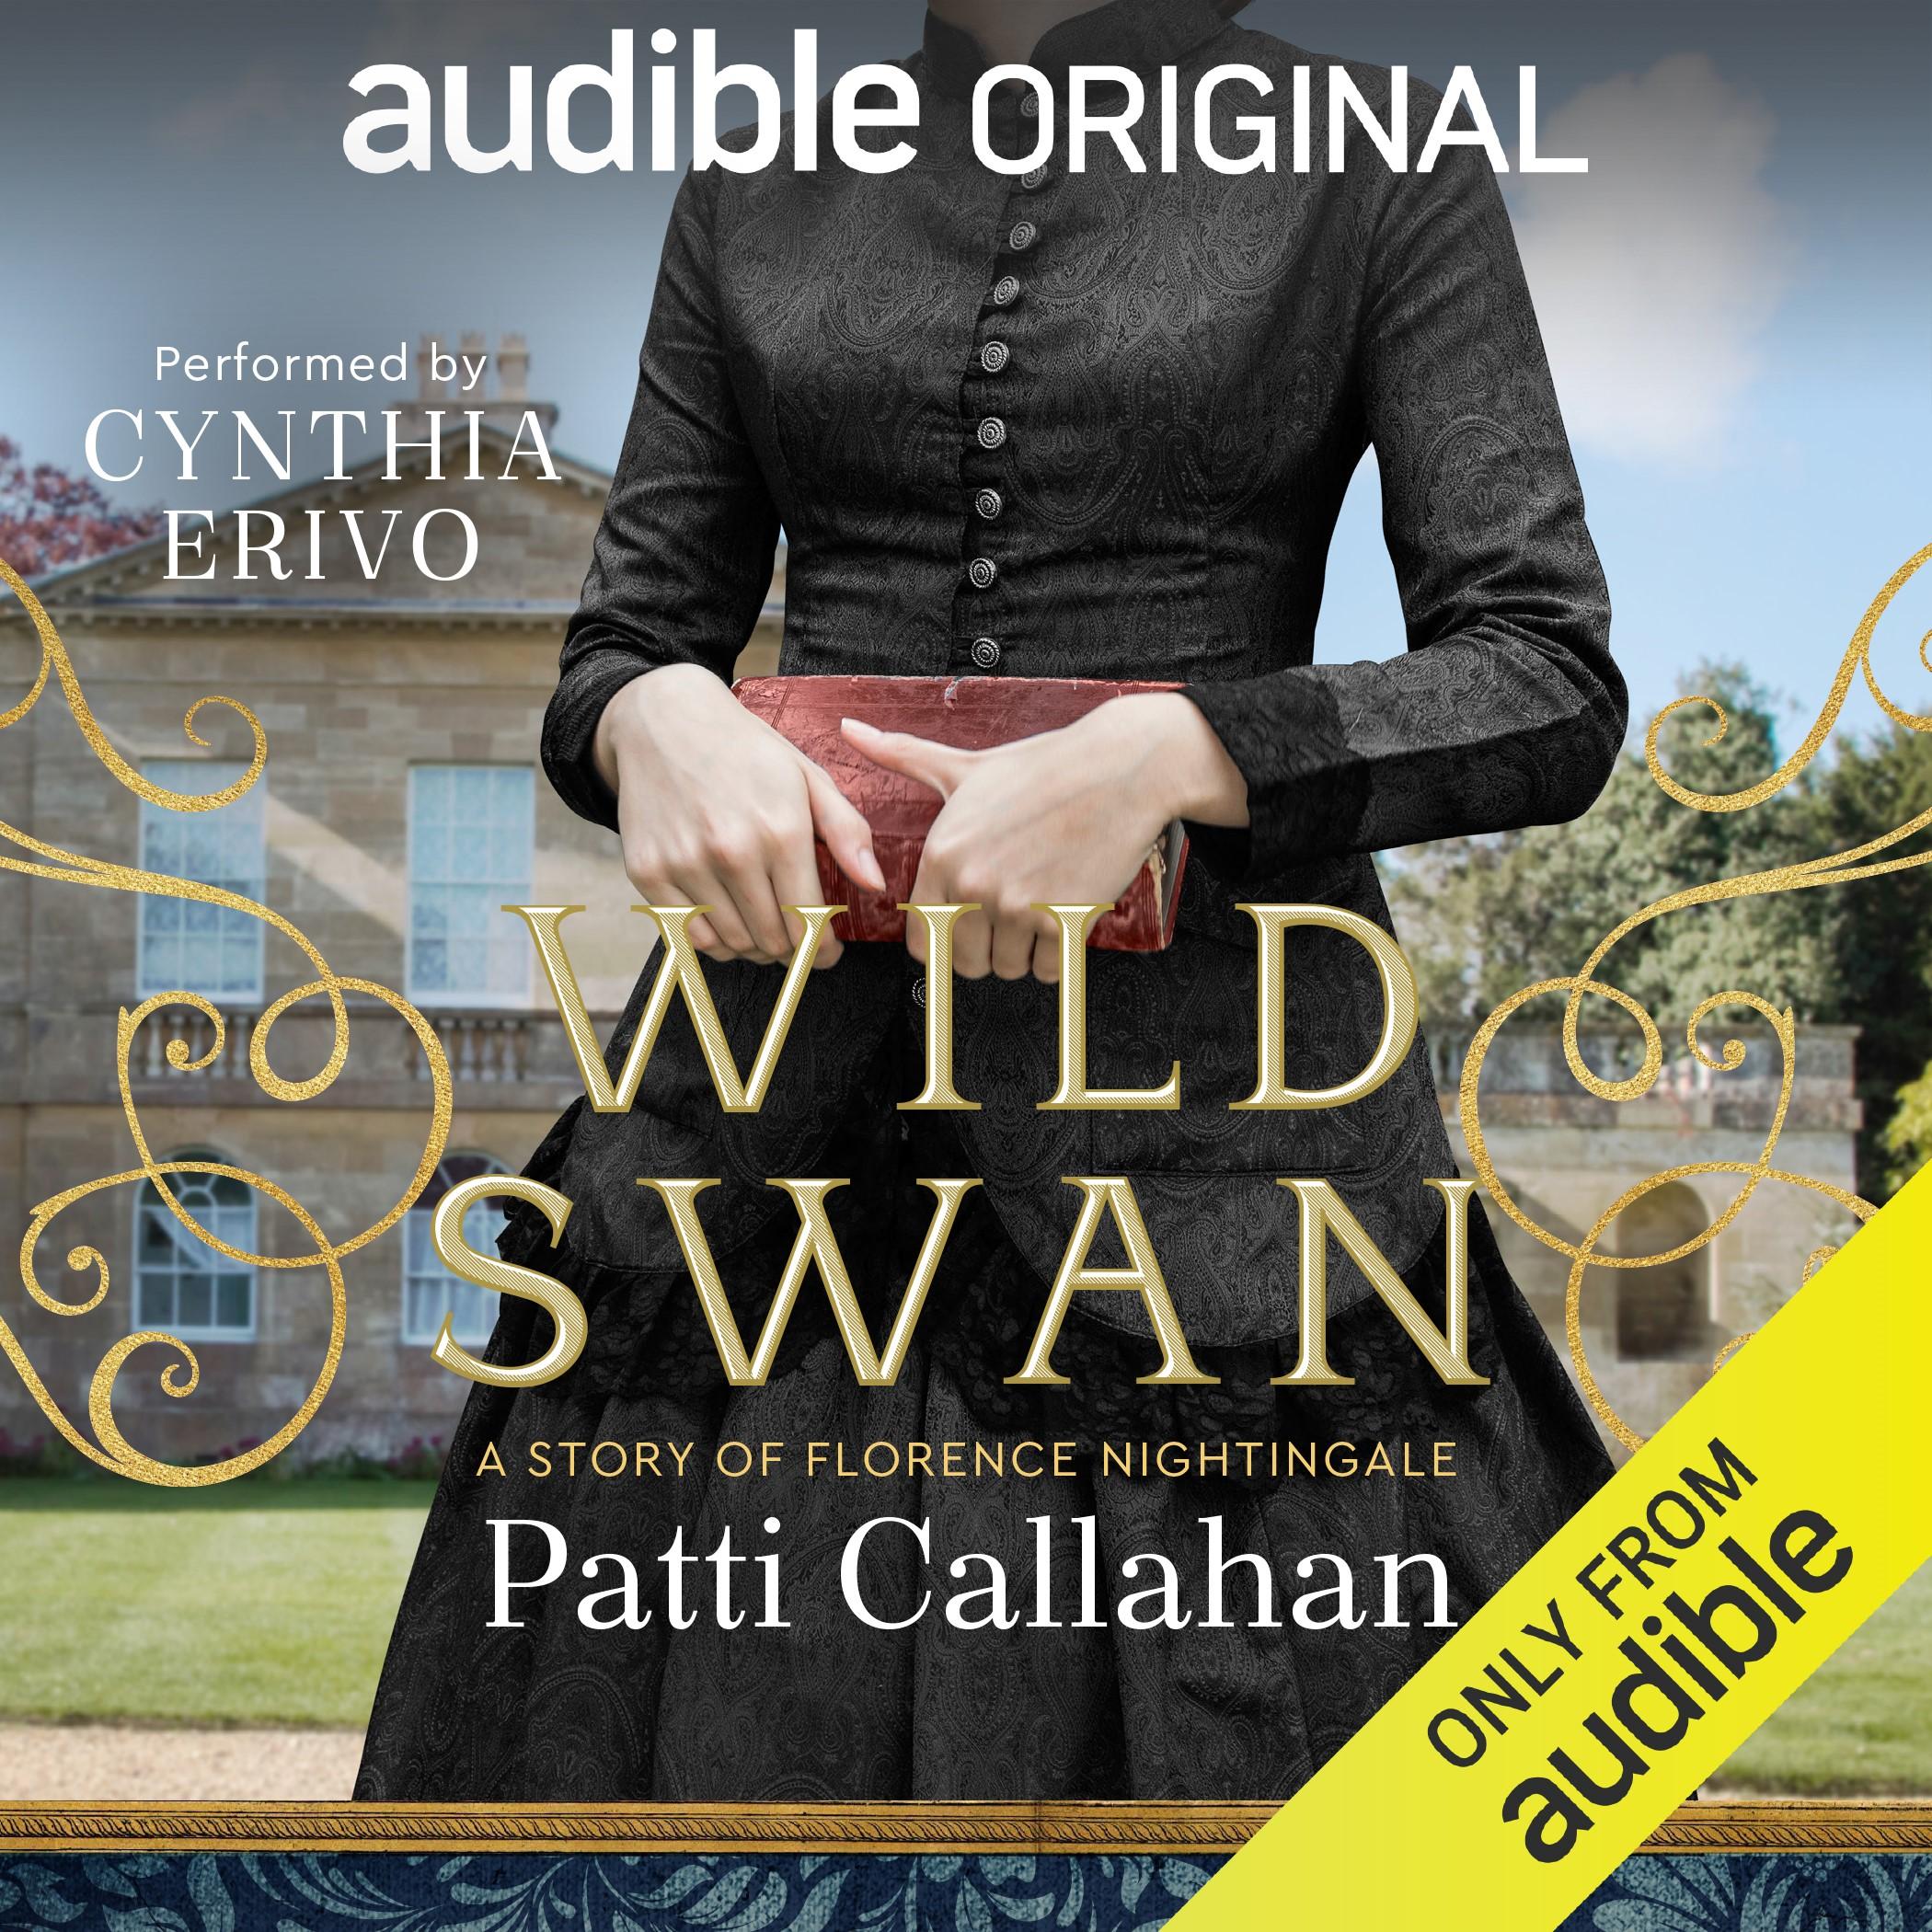 Wild Swan Audible Original